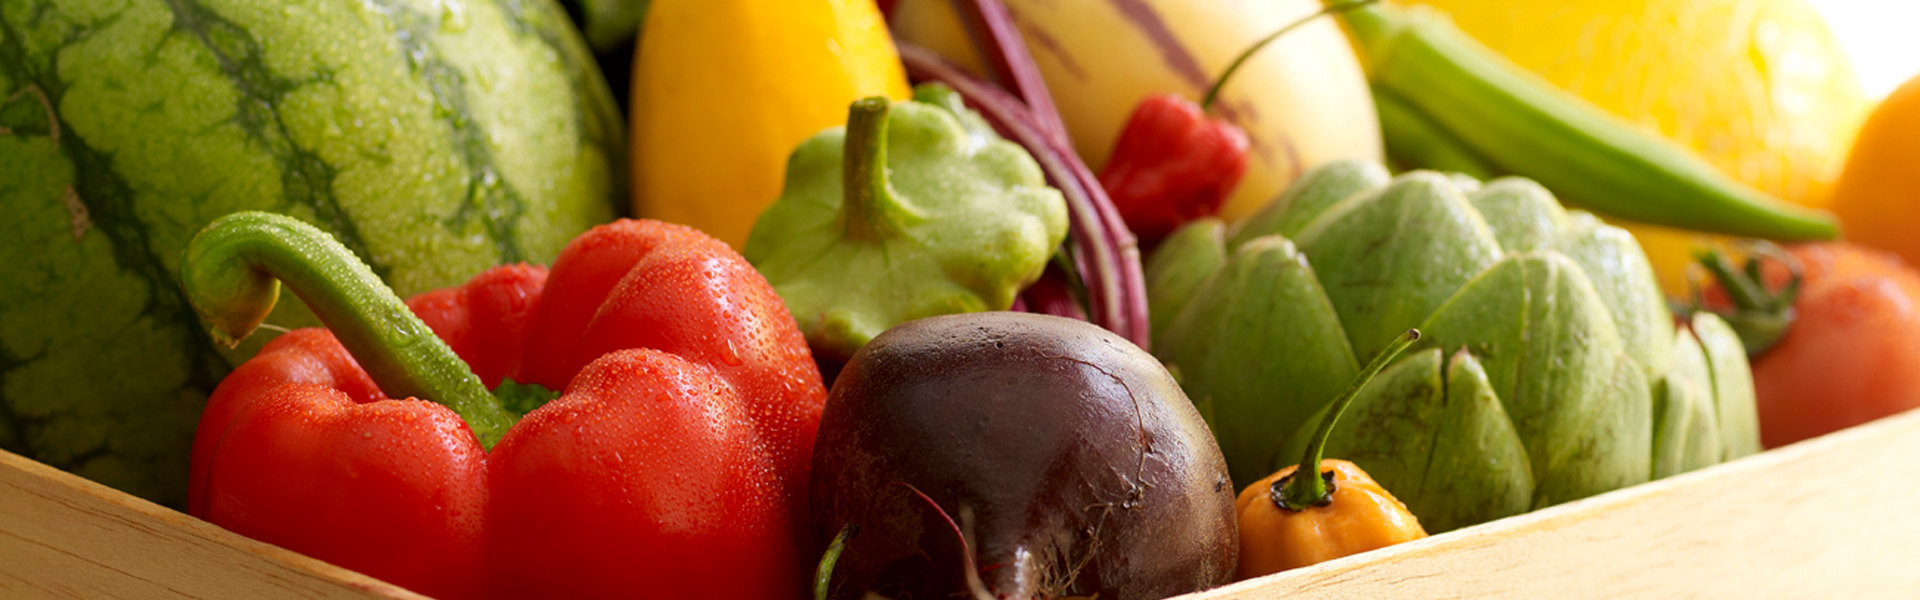 Organic Local Produce